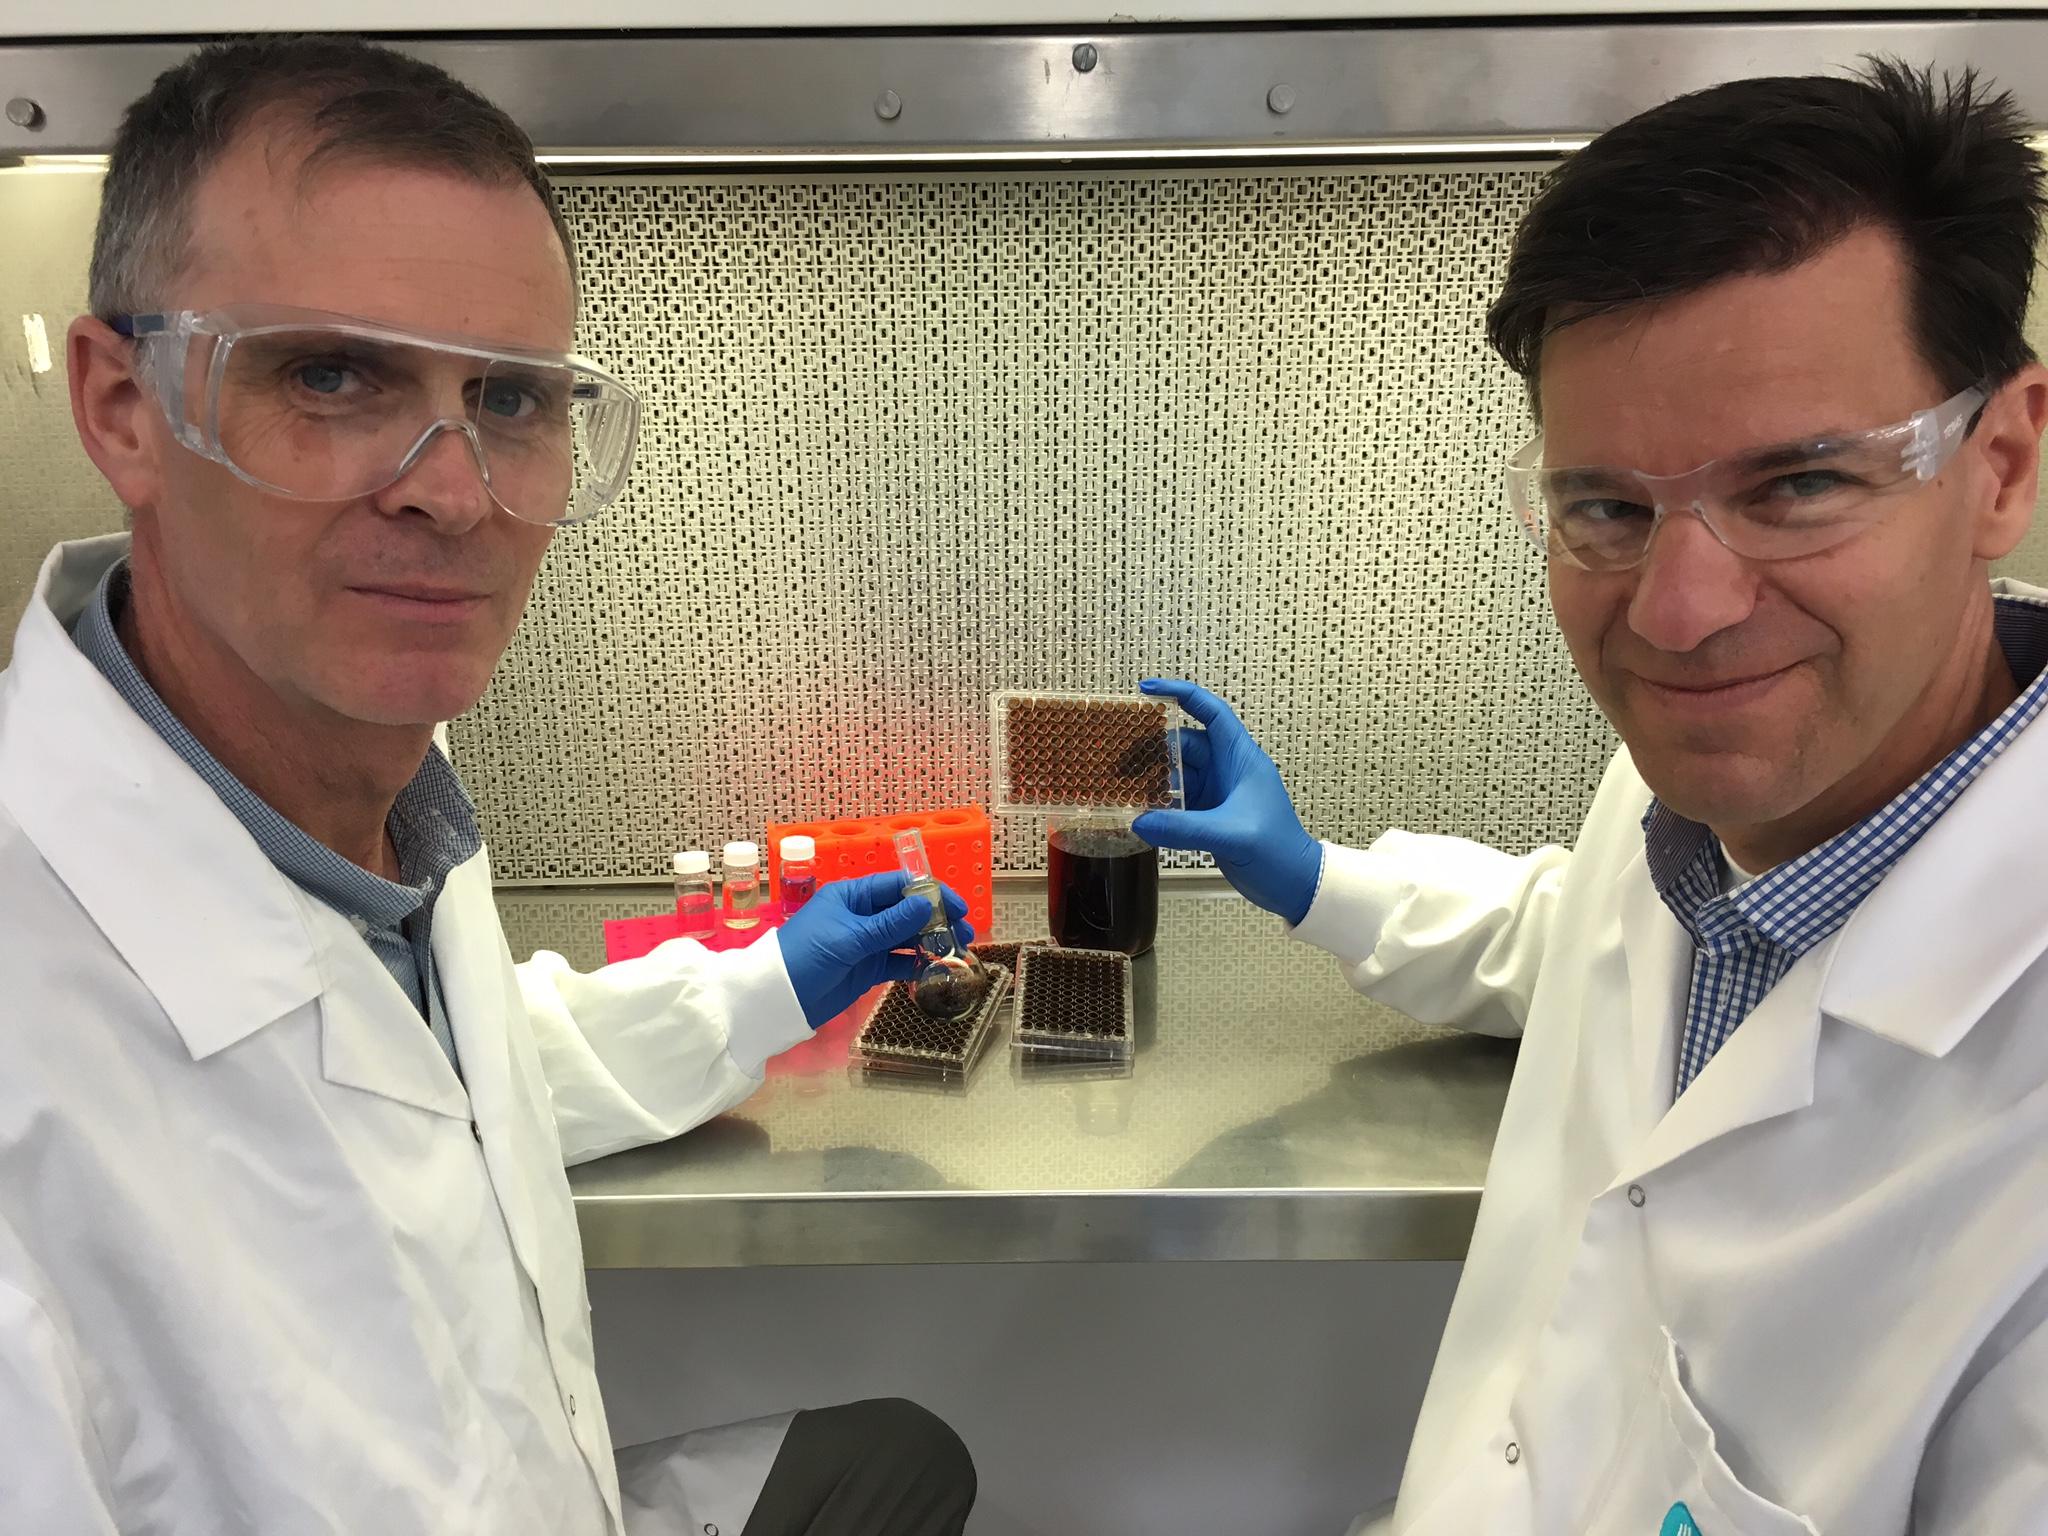 CSIRO turns to primordial goo to improve medical implants